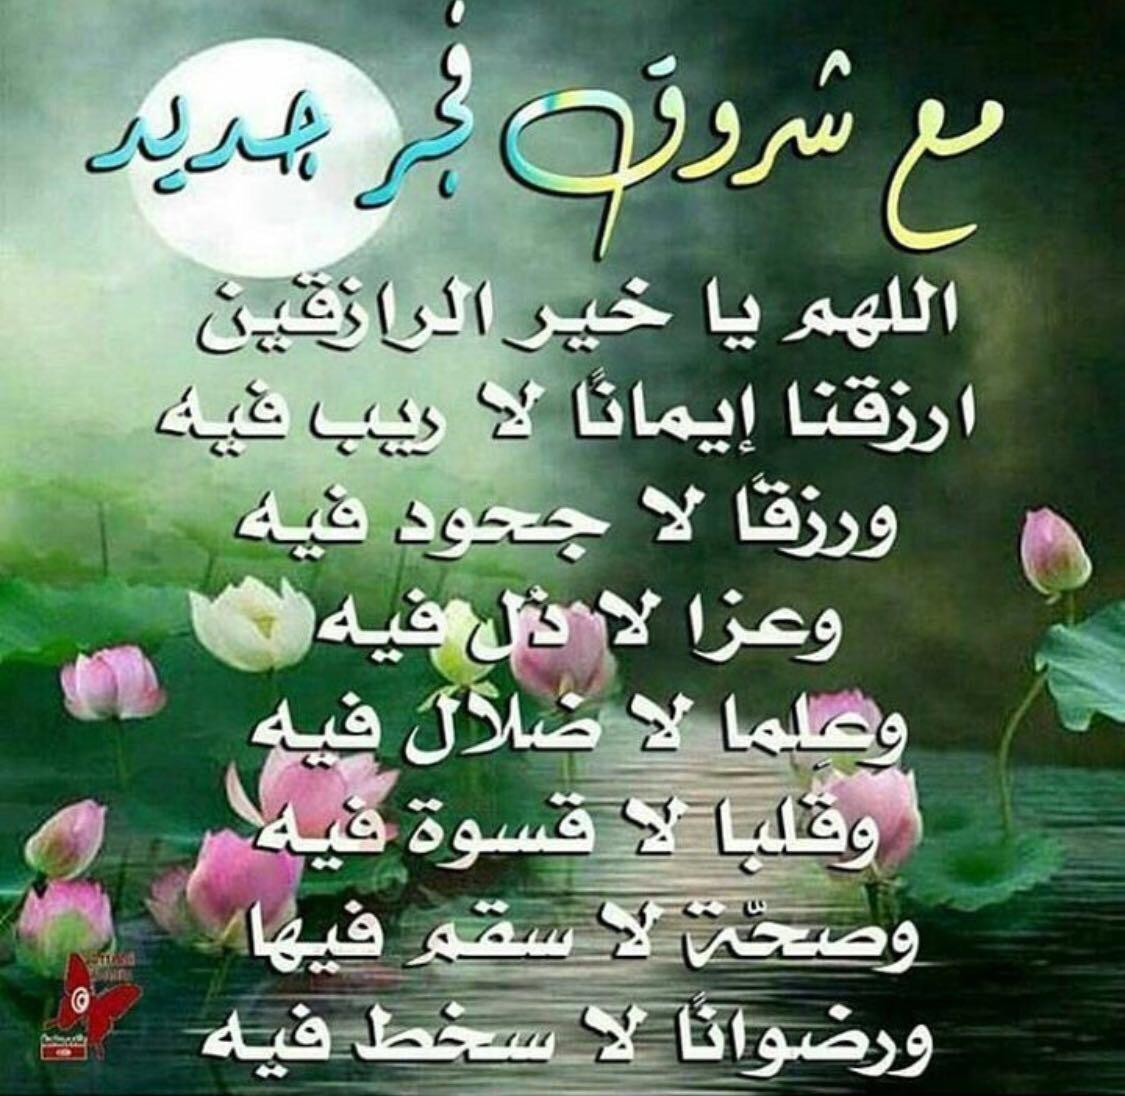 55187d474 اجمل ماقيل عن الصباح , اروع كلمات صباحيه تدعو للتفاؤل - حبيبي